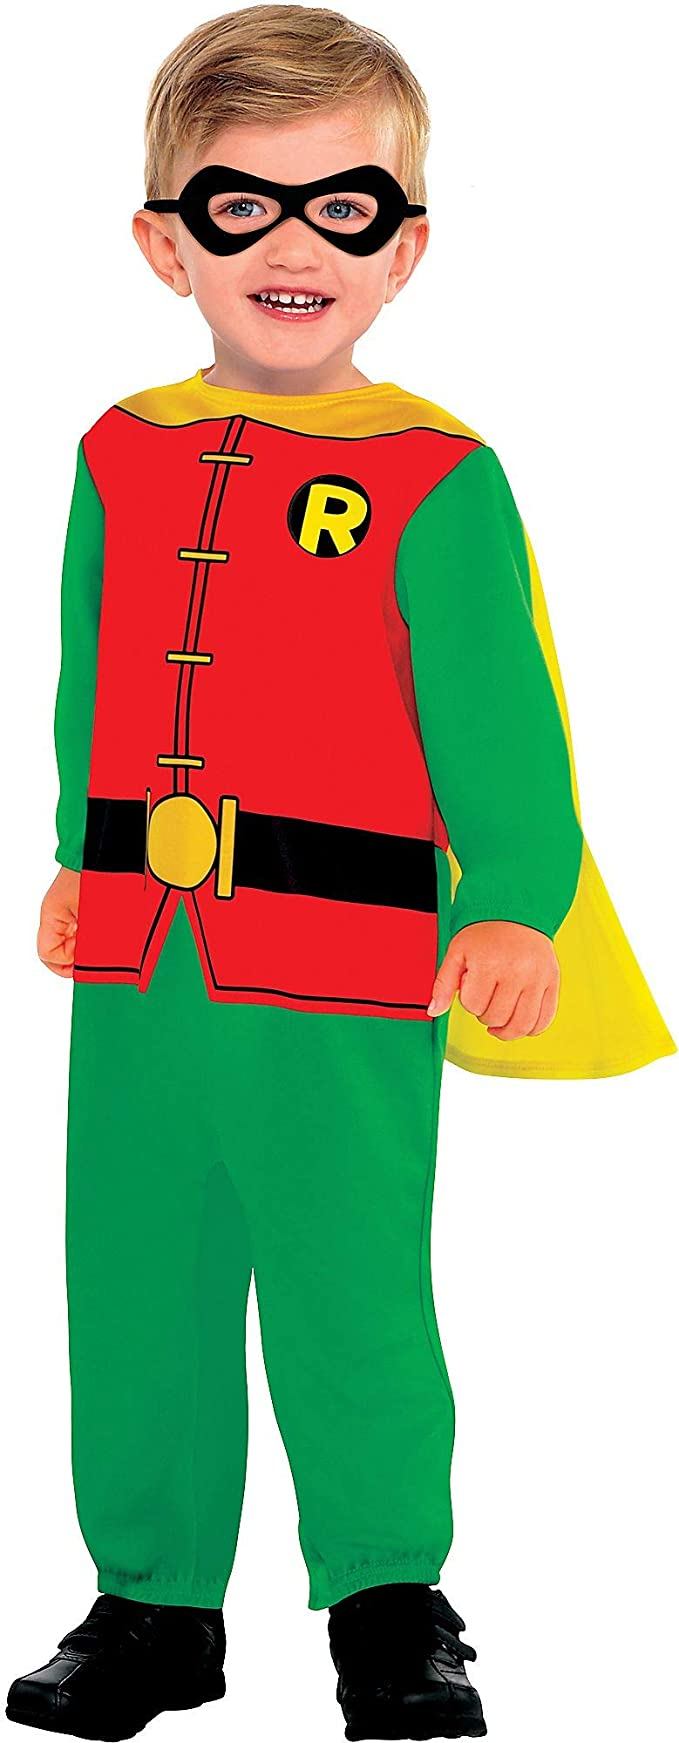 Amazon.com: Traje de ti mismo clásico Robin Halloween ...